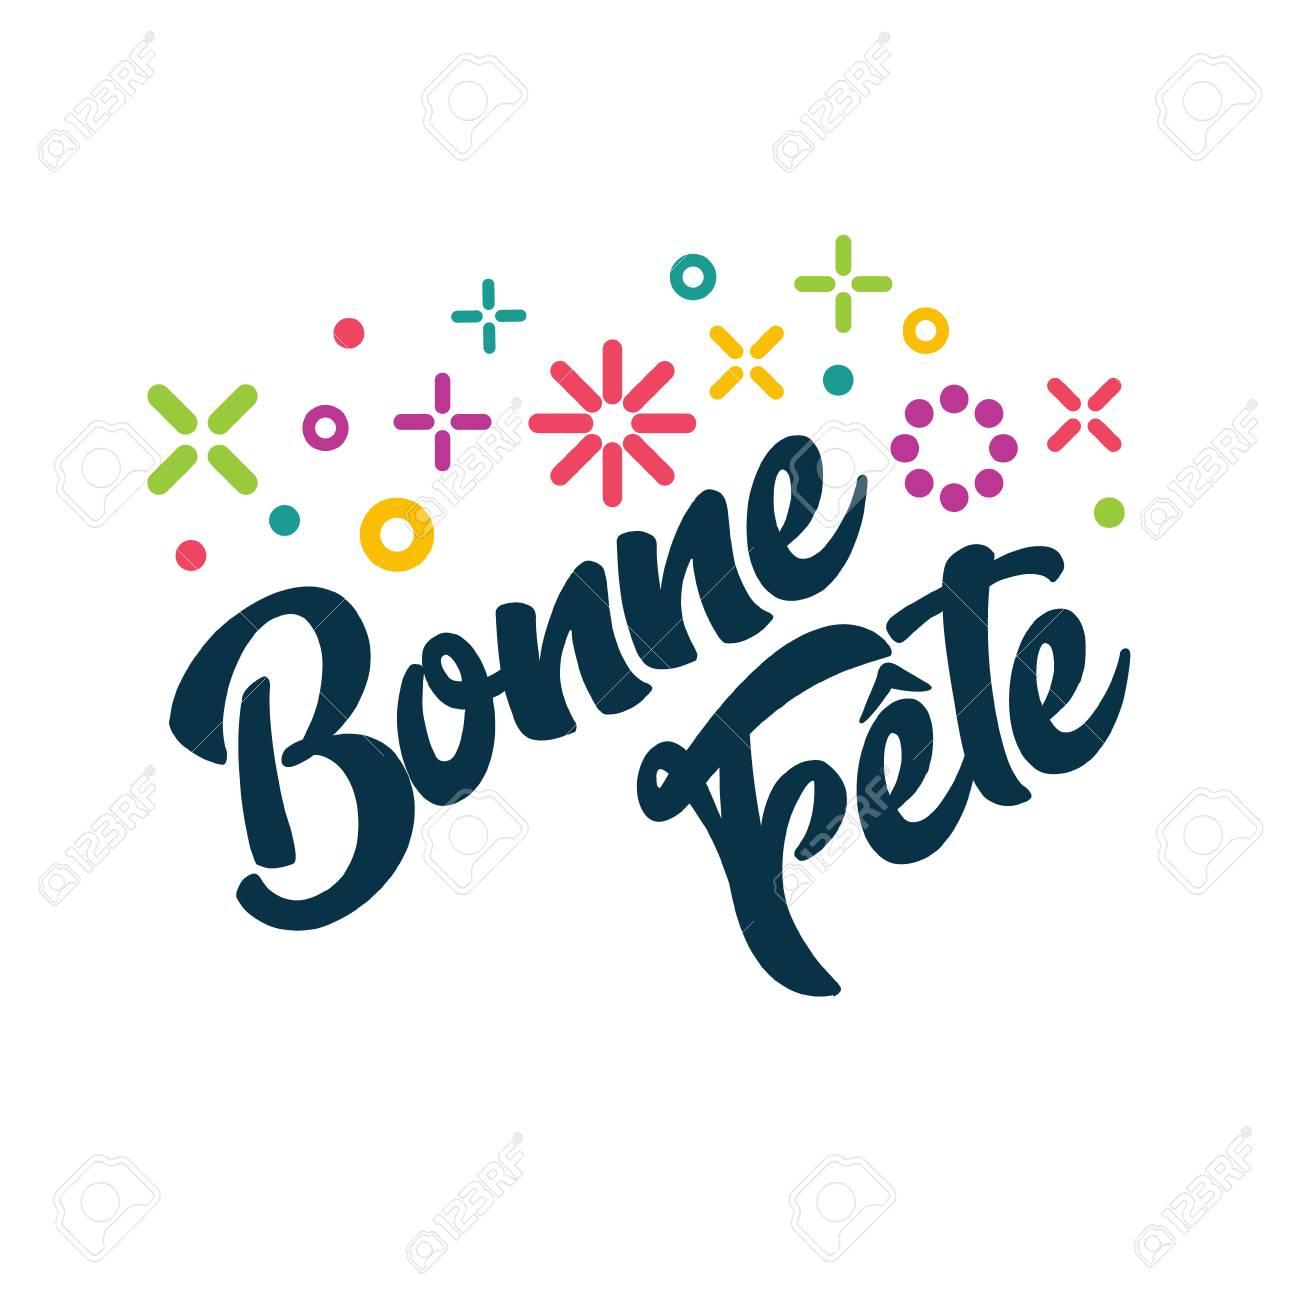 Bonne Fete - French Happy Birthday Greeting Invitation Card - 94100097